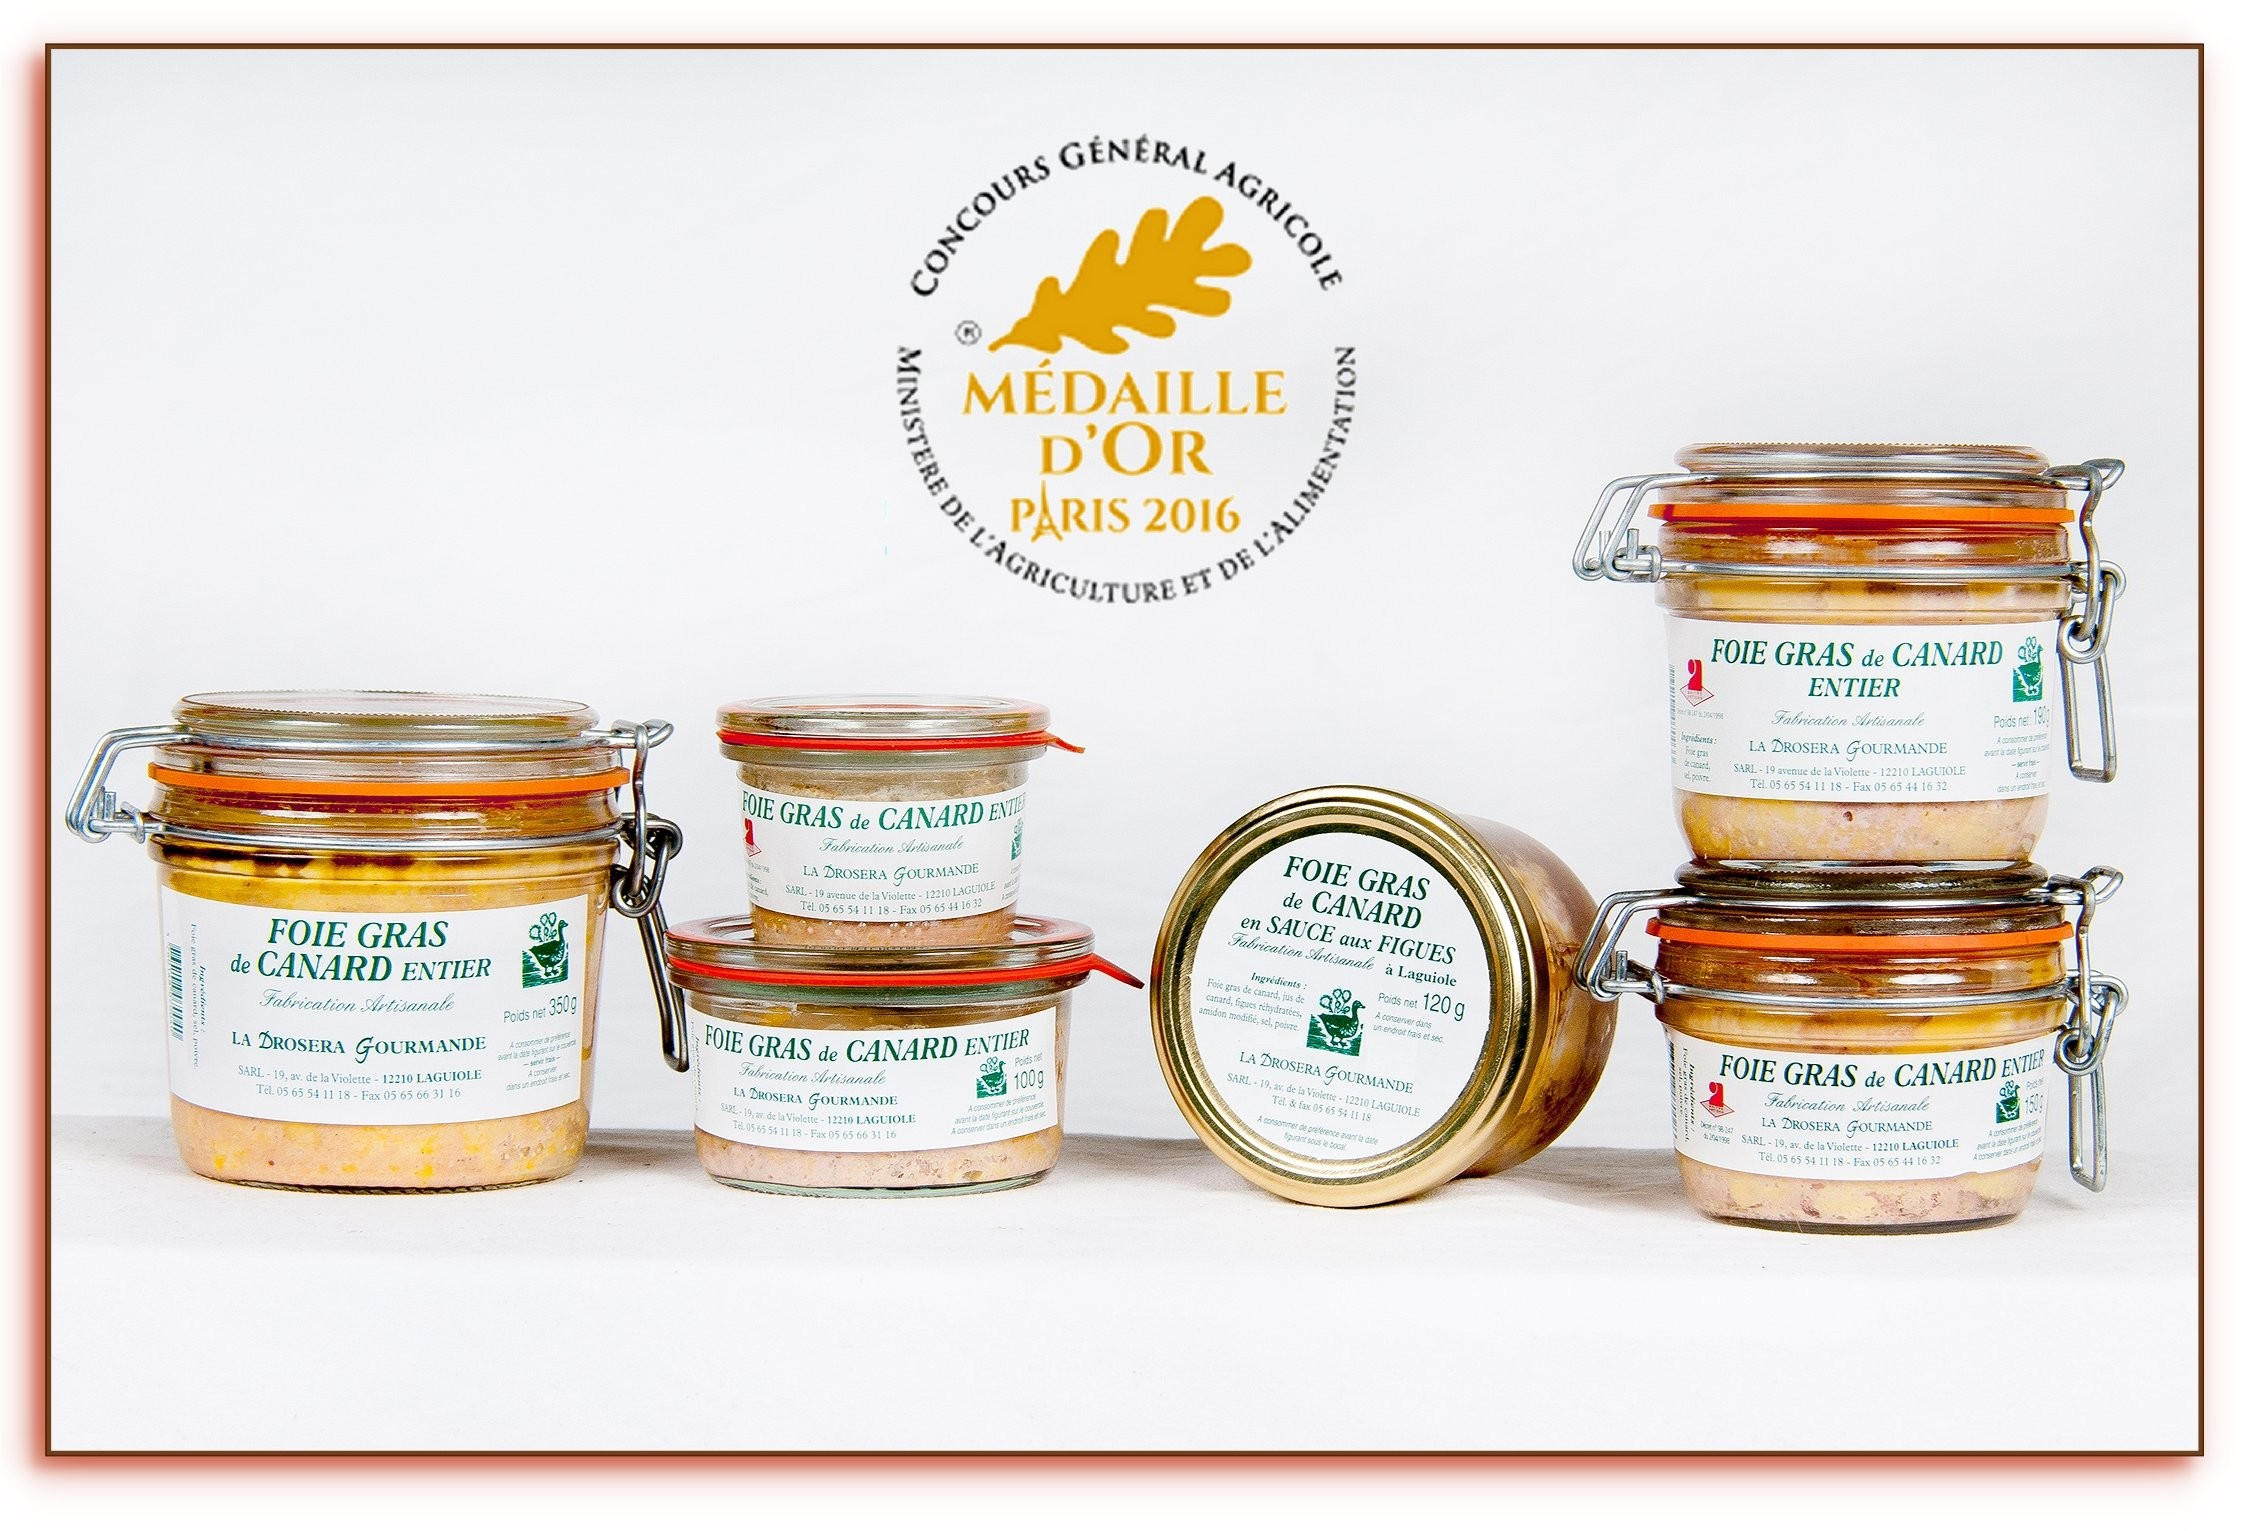 bloc-foie-gras-terroir-aveyron